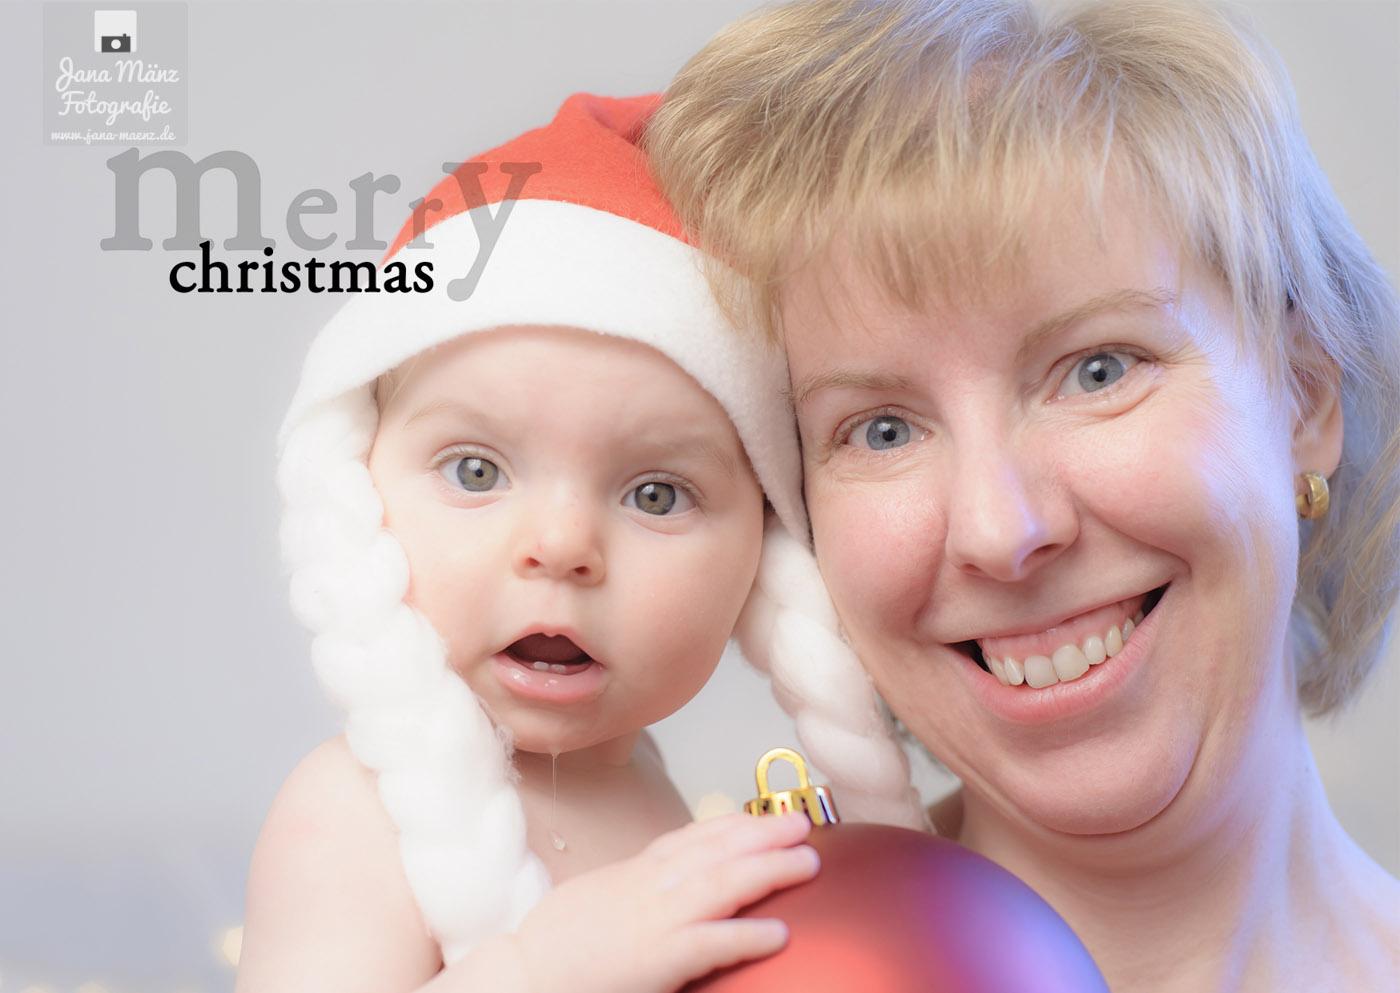 baby weihnachtskarten jana m nz fotografin buchautorin mentorin